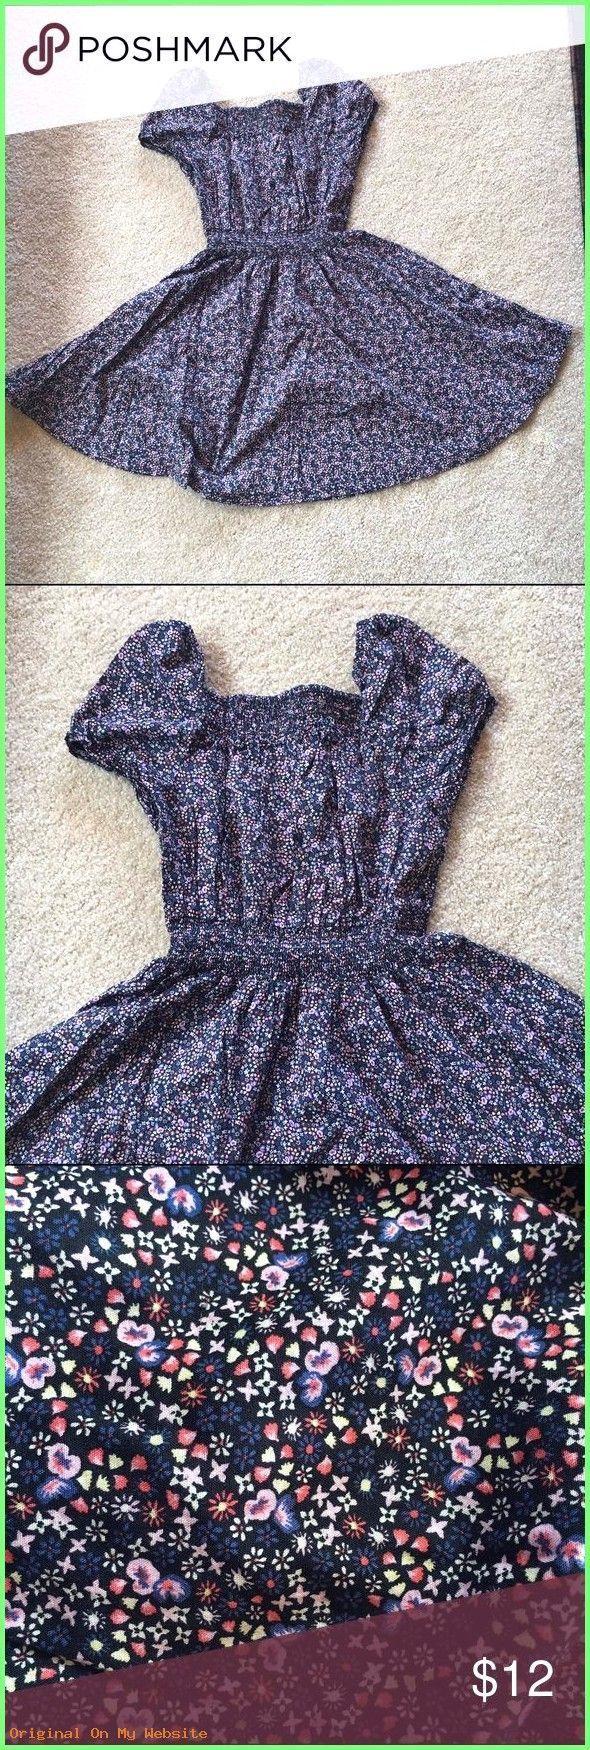 #dress #flower #great #Print #sommerkleider #summe…